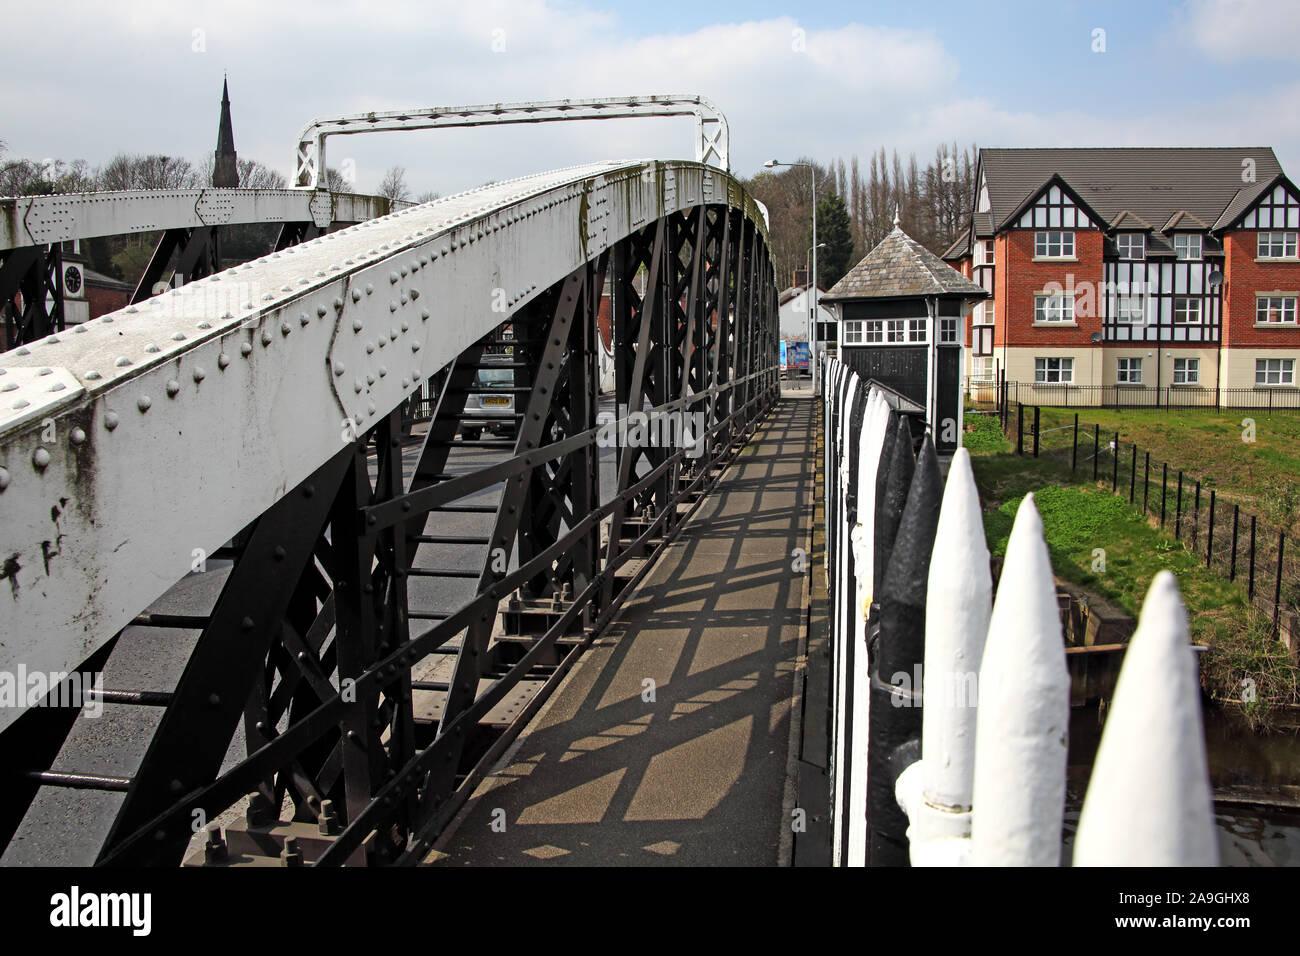 HotpixUK,@HotpixUK,GoTonySmith,UK,Victorian,rivets,iron,steel,footway,footpath,walkway across